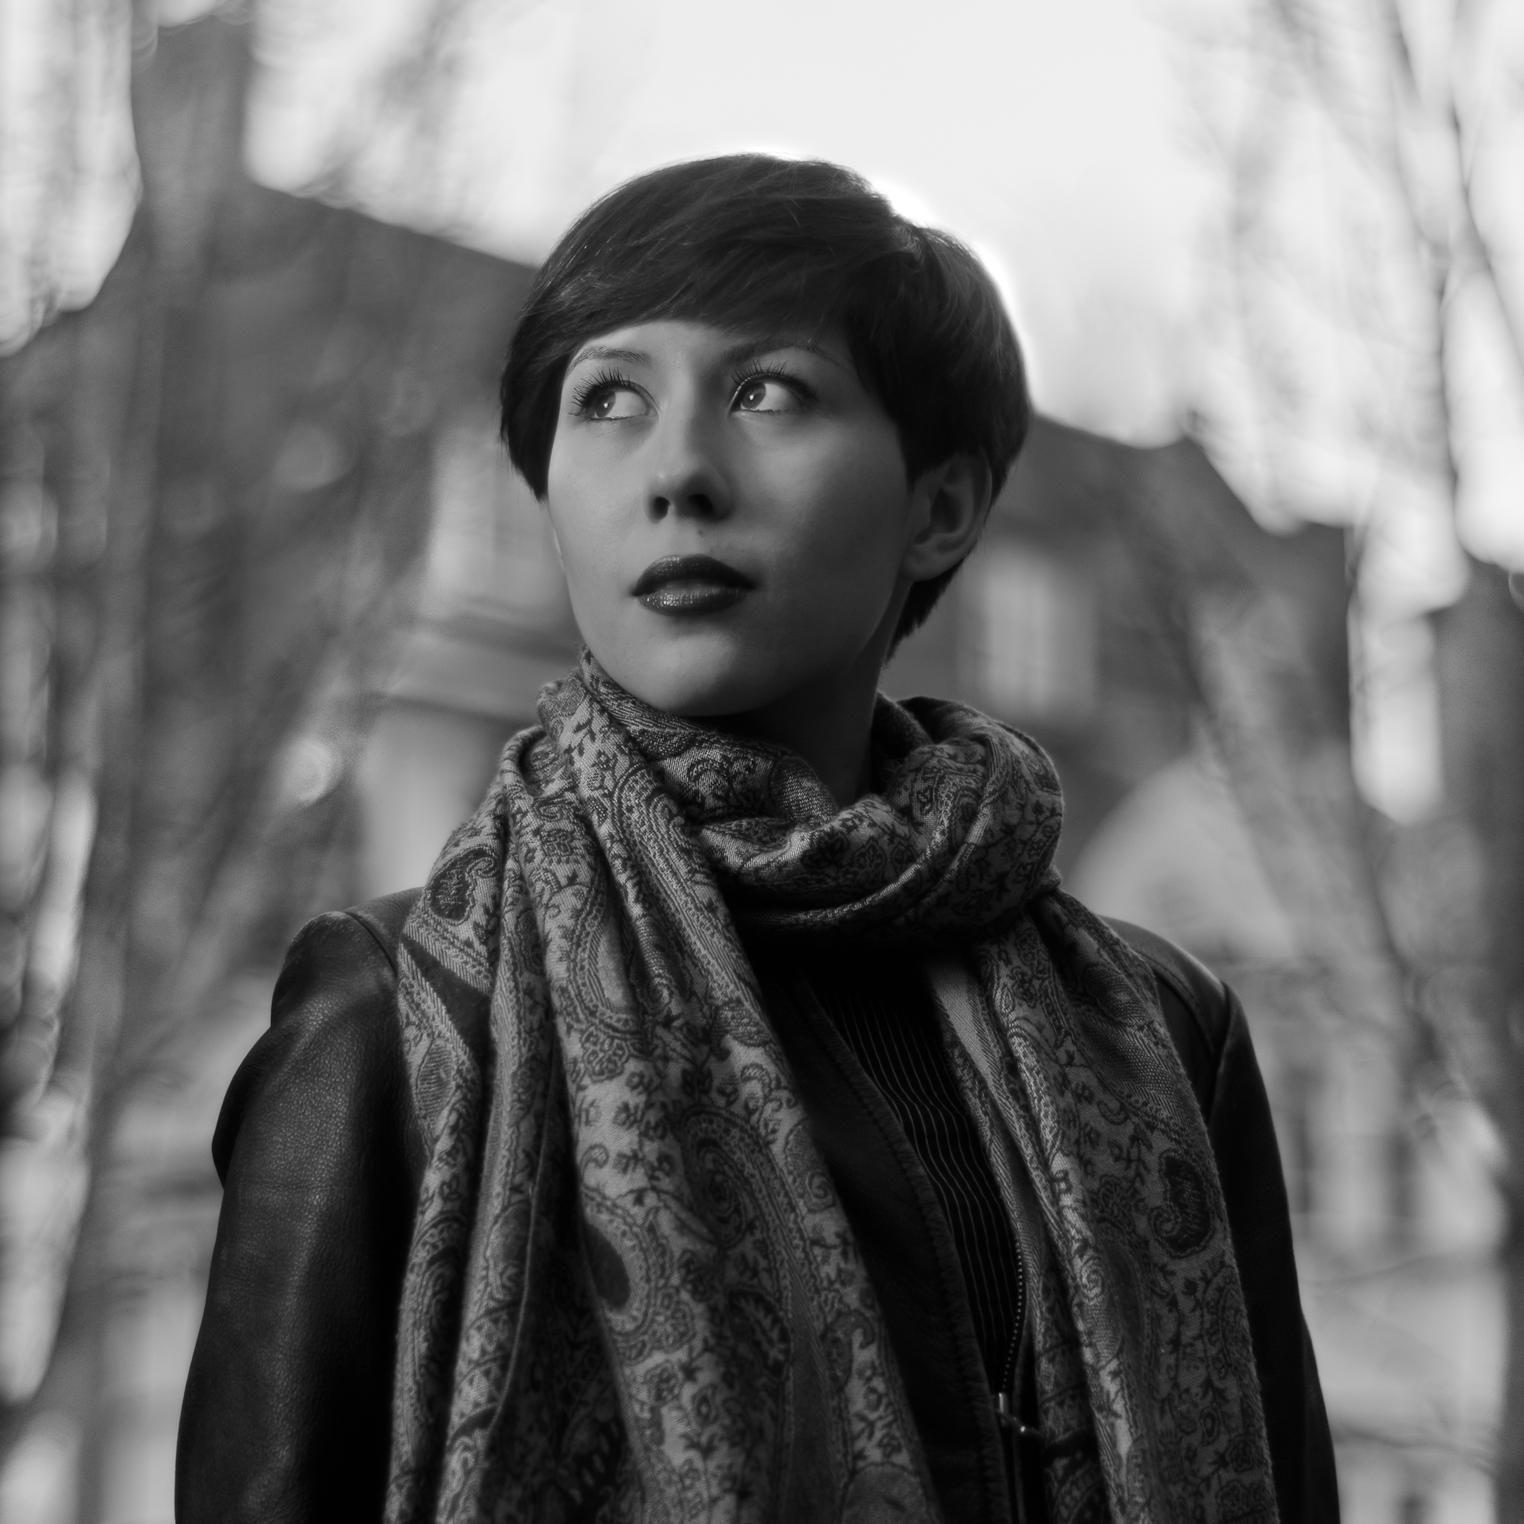 Natalia Baltazar